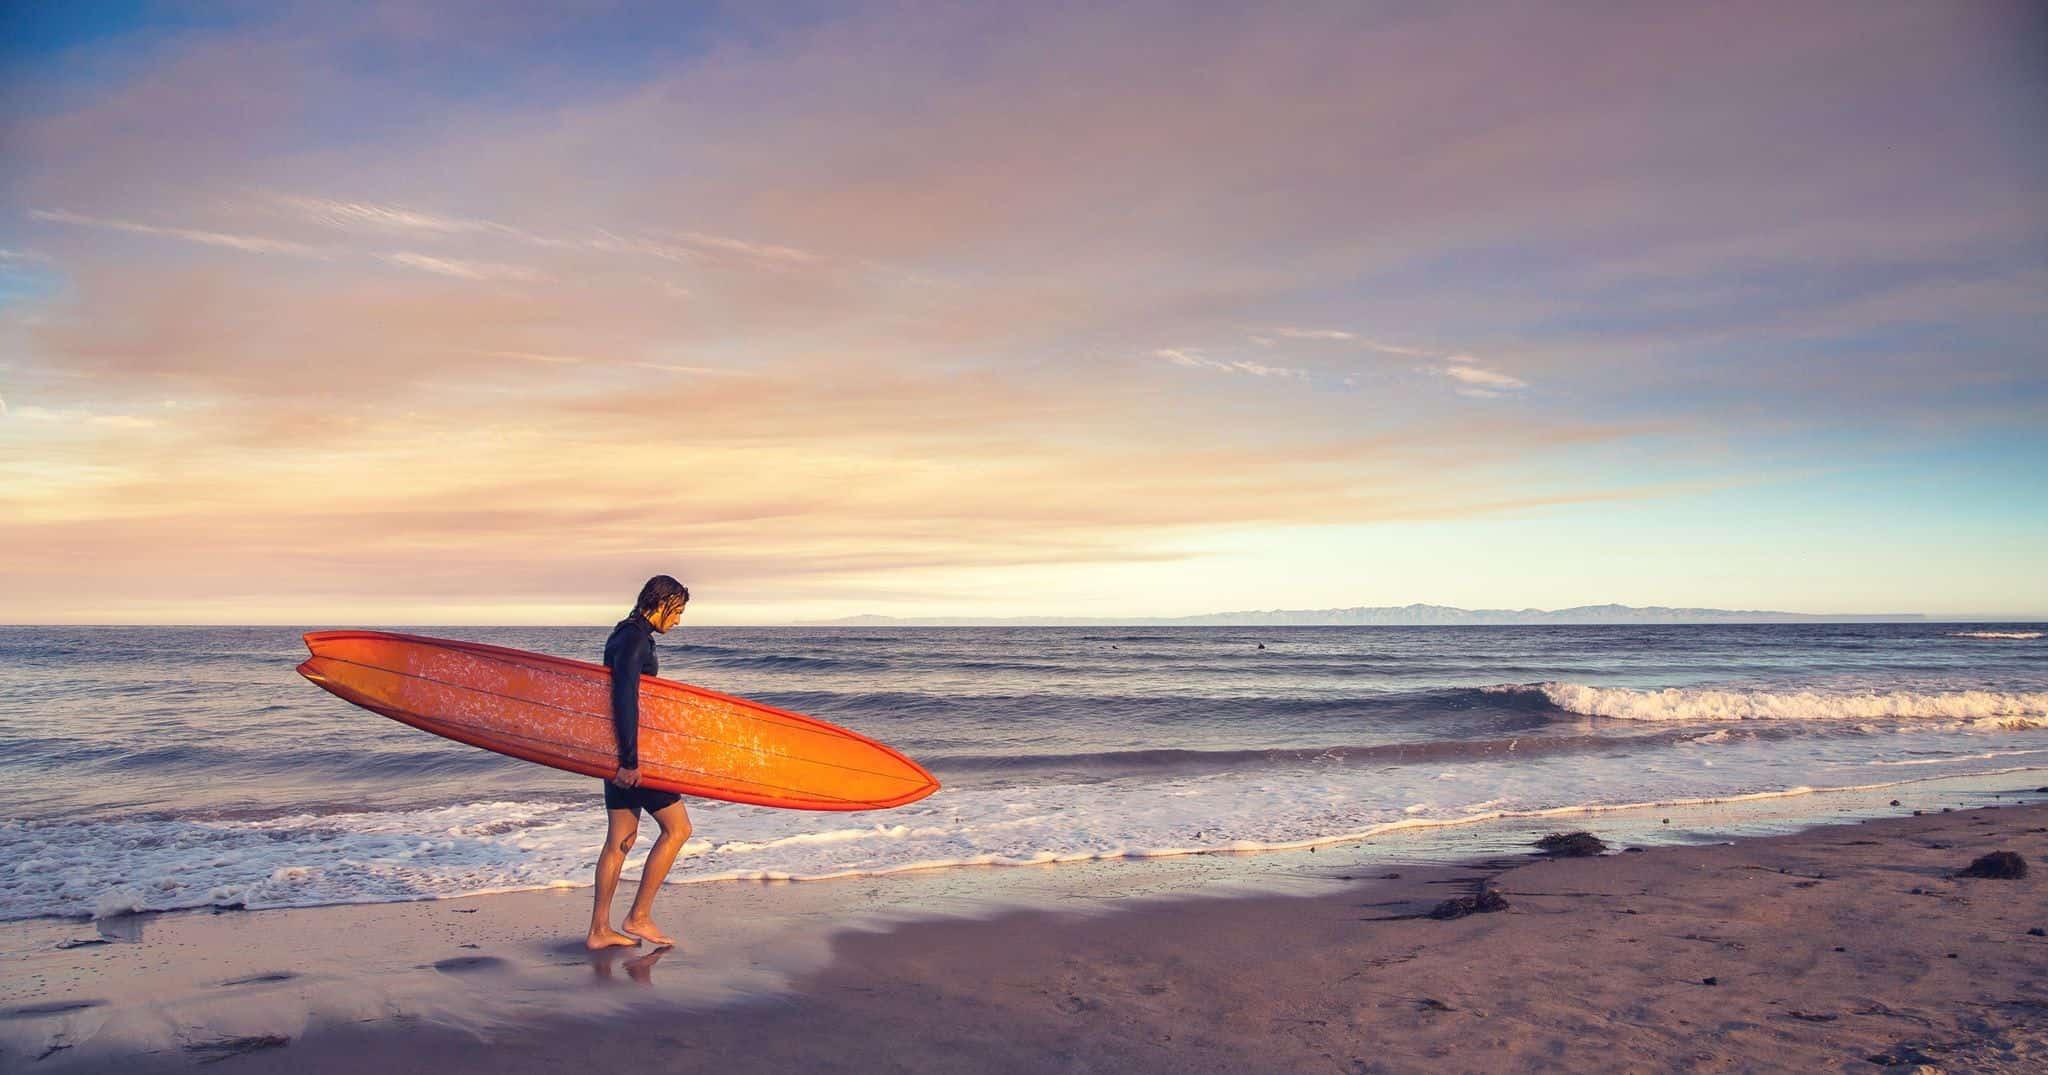 UCSB Beach surfing